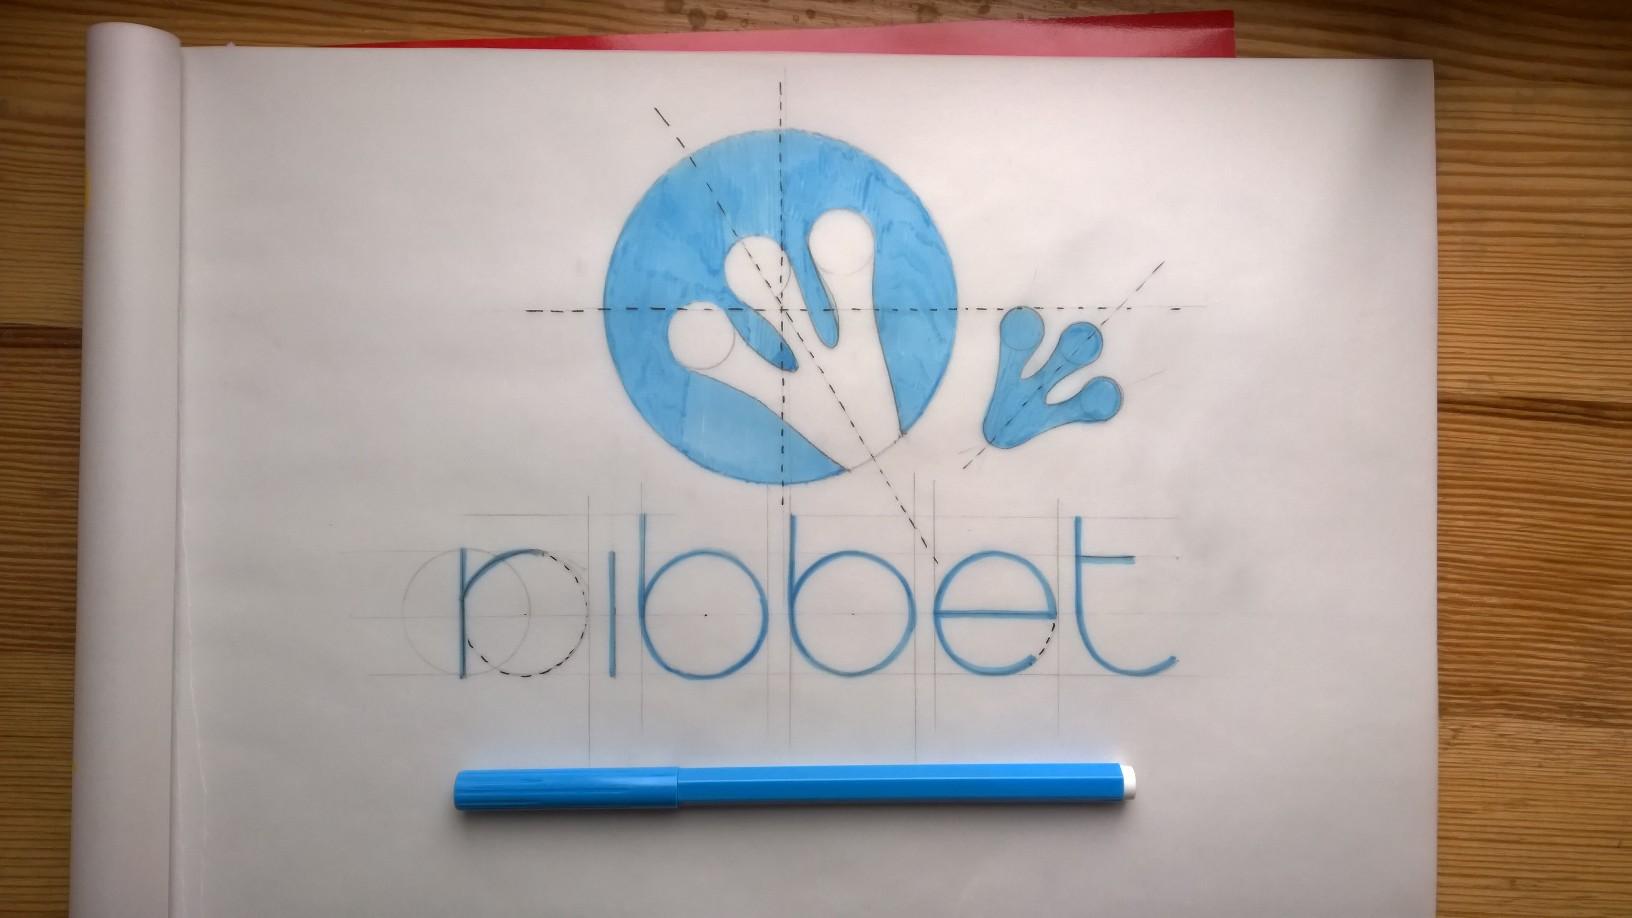 ribbet logo design mascot